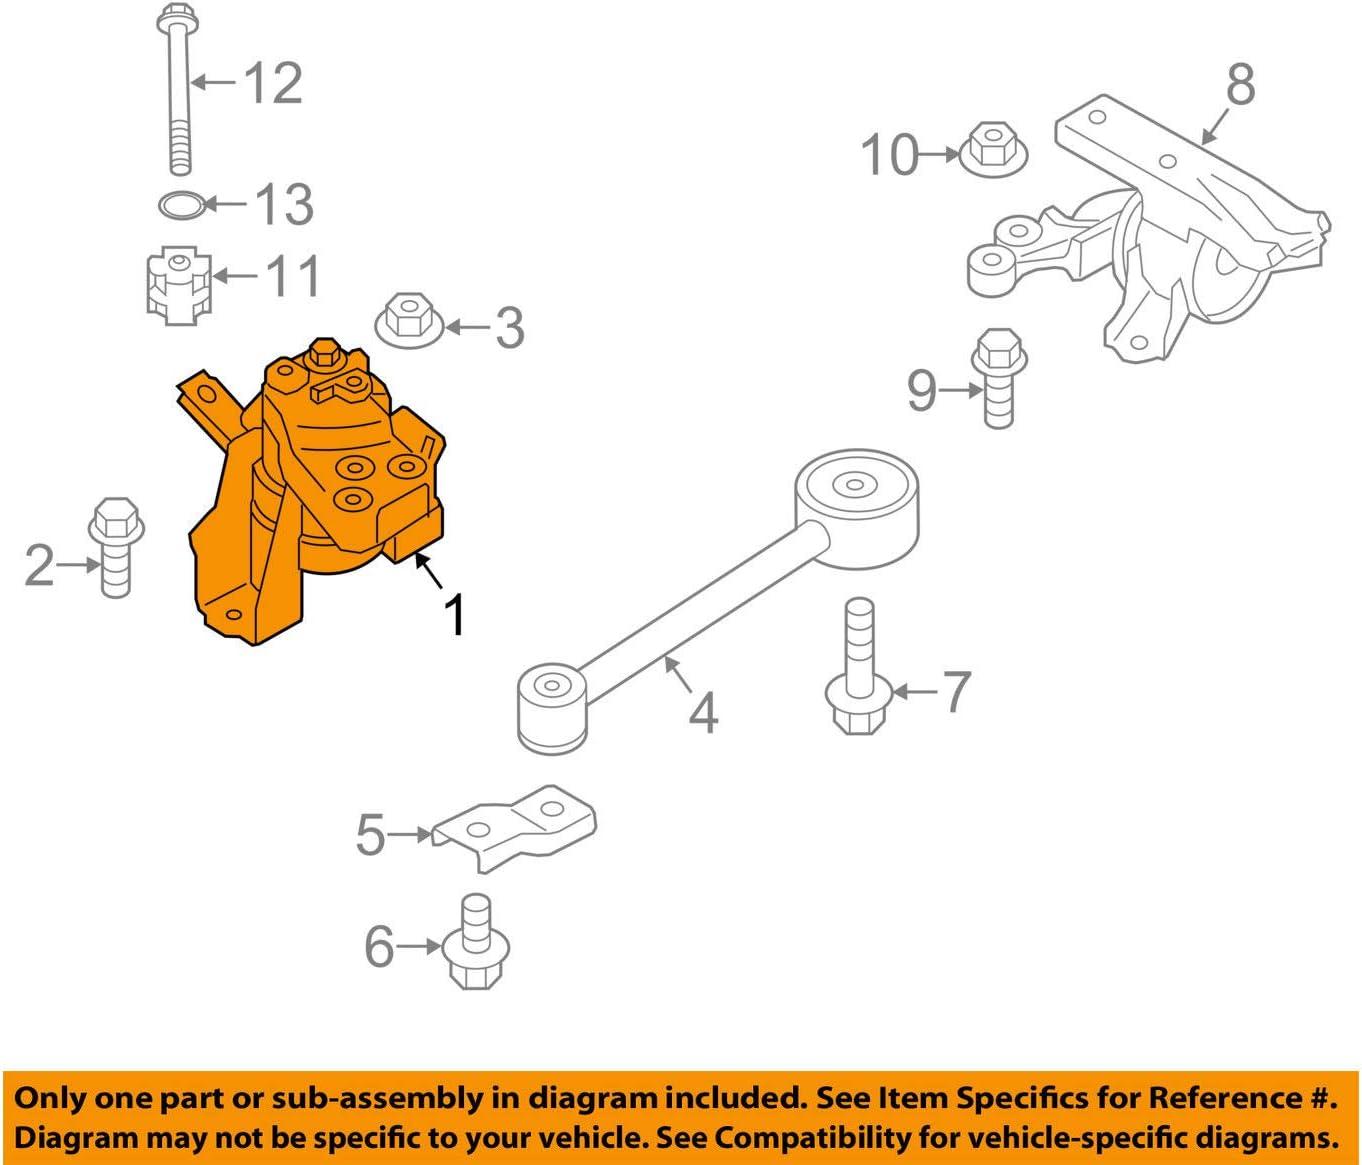 Amazon.com: Mitsubishi OEM 14-15 Mirage-Engine Motor Mount Torque Strut  1093A146: AutomotiveAmazon.com